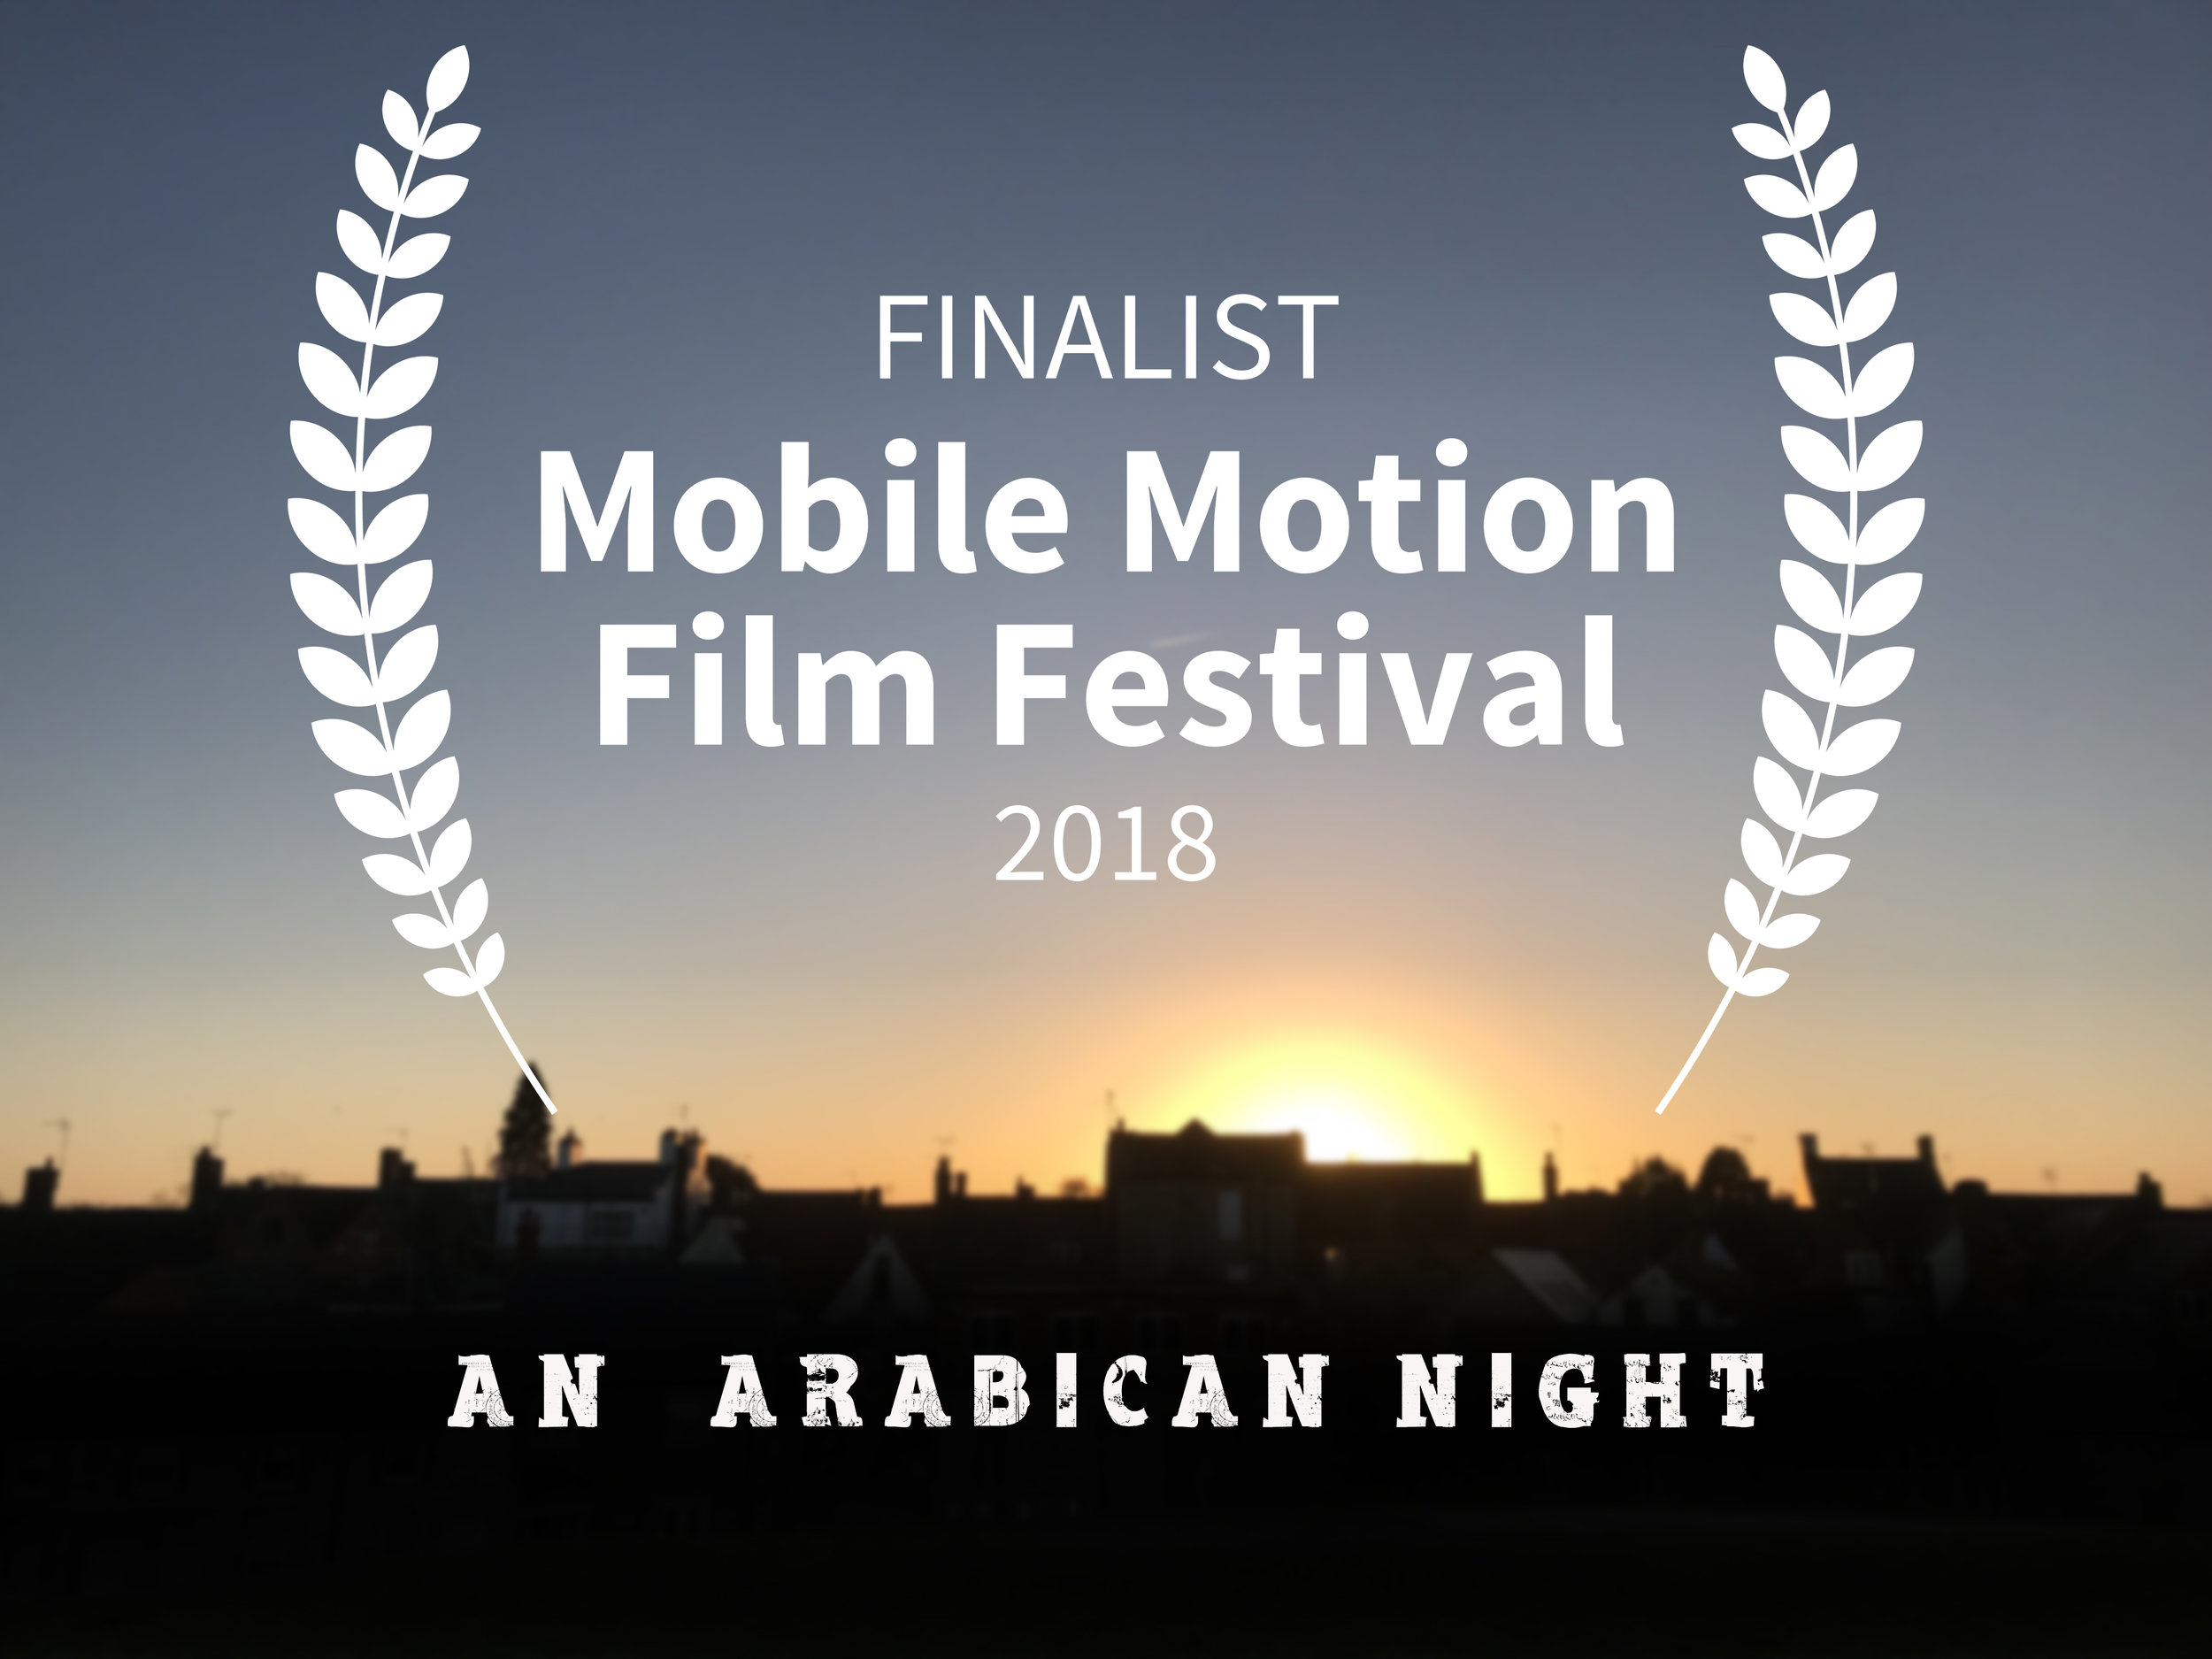 Arabican Night MoMo.jpg